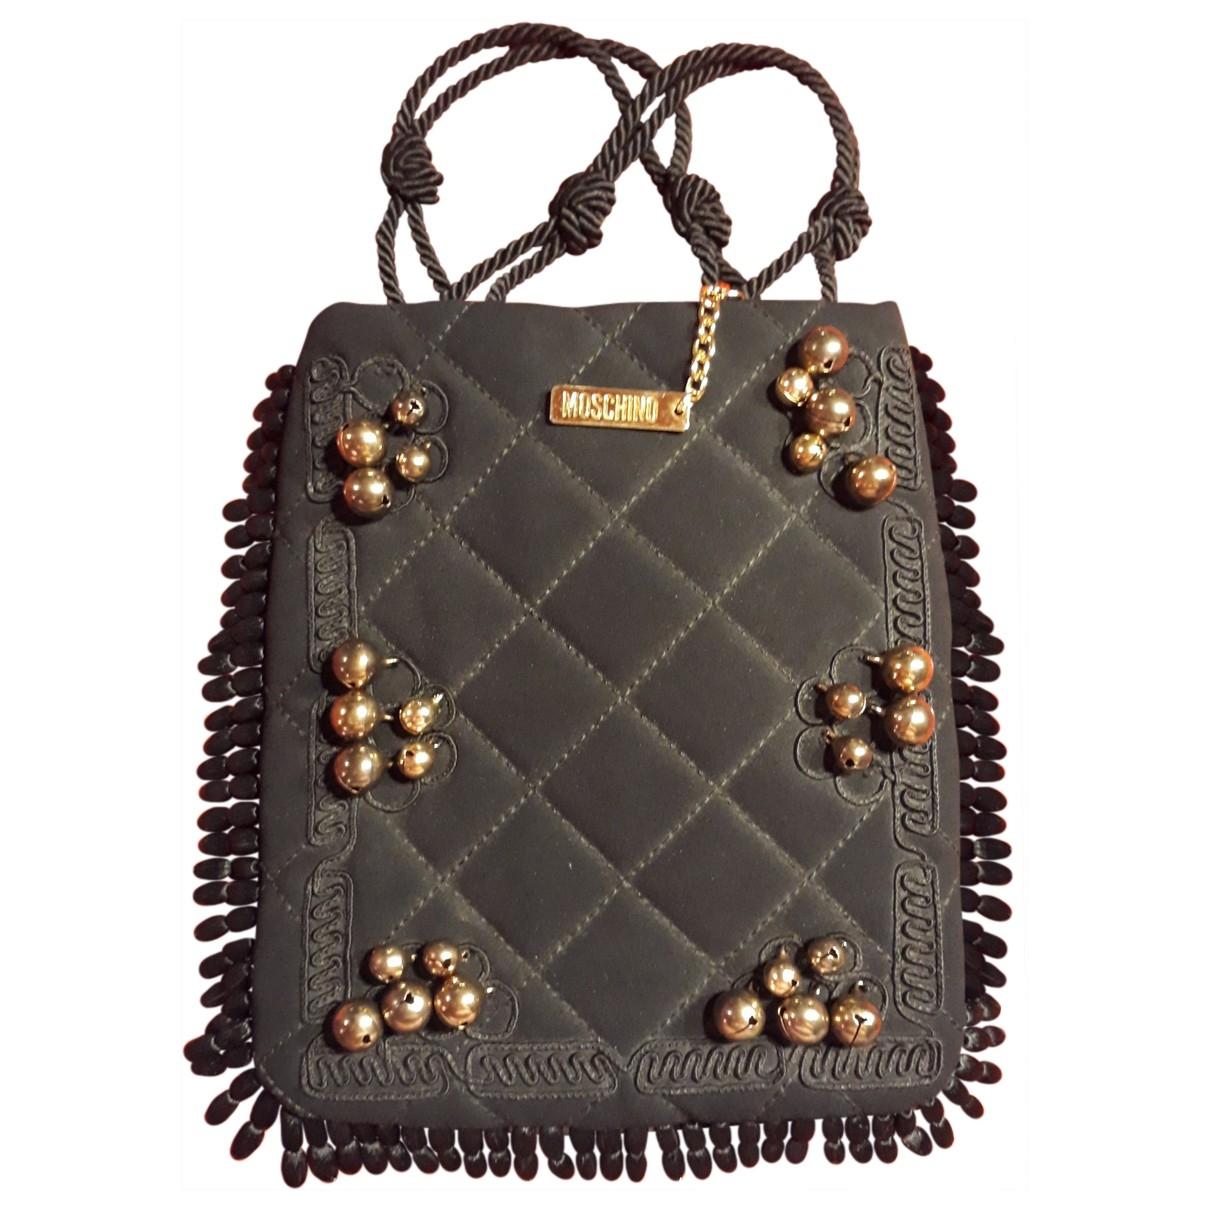 Moschino \N Black Cotton handbag for Women \N